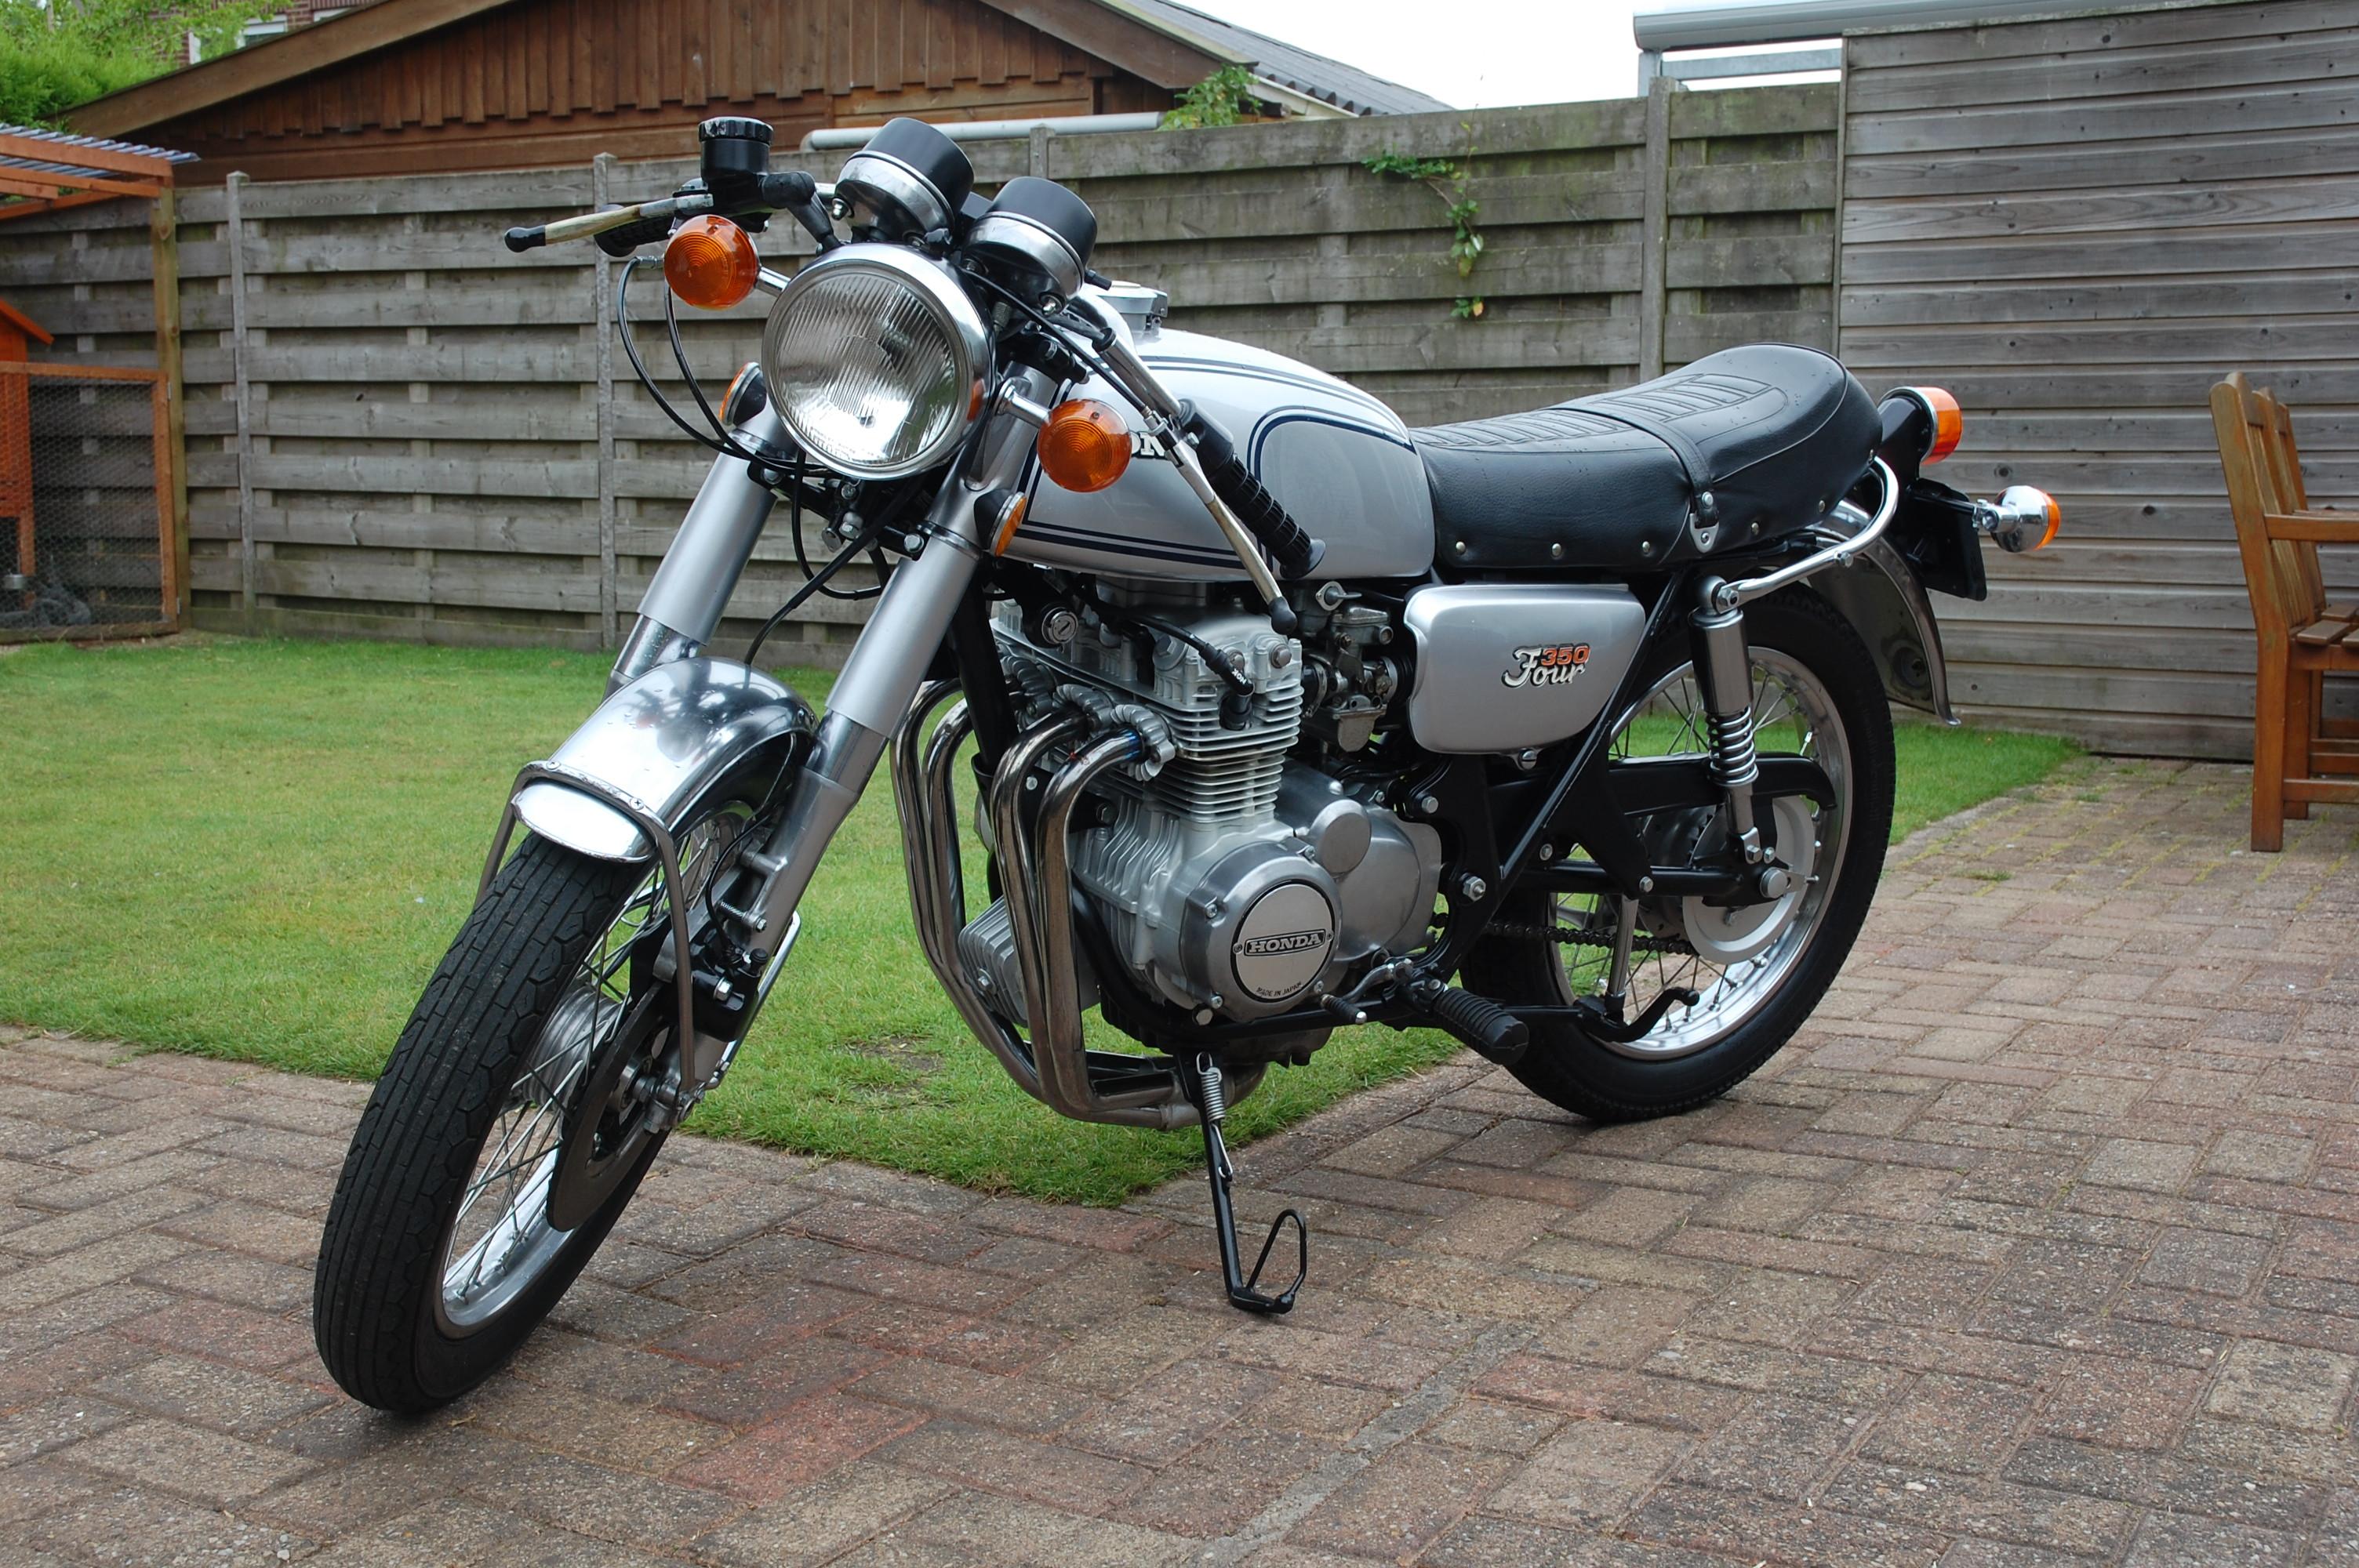 File:Honda CB350F 1973.jpg - Wikimedia Commons